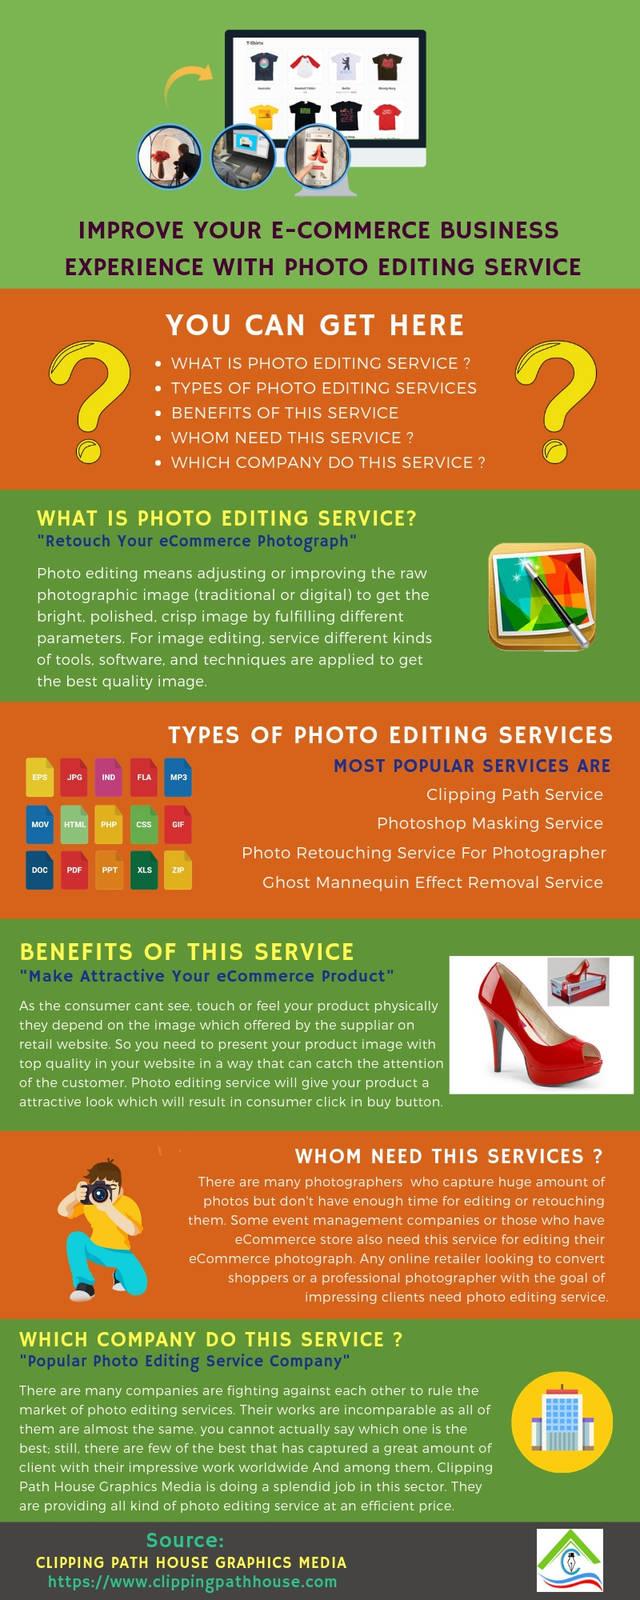 Photo editing service by cph graphics media jpg